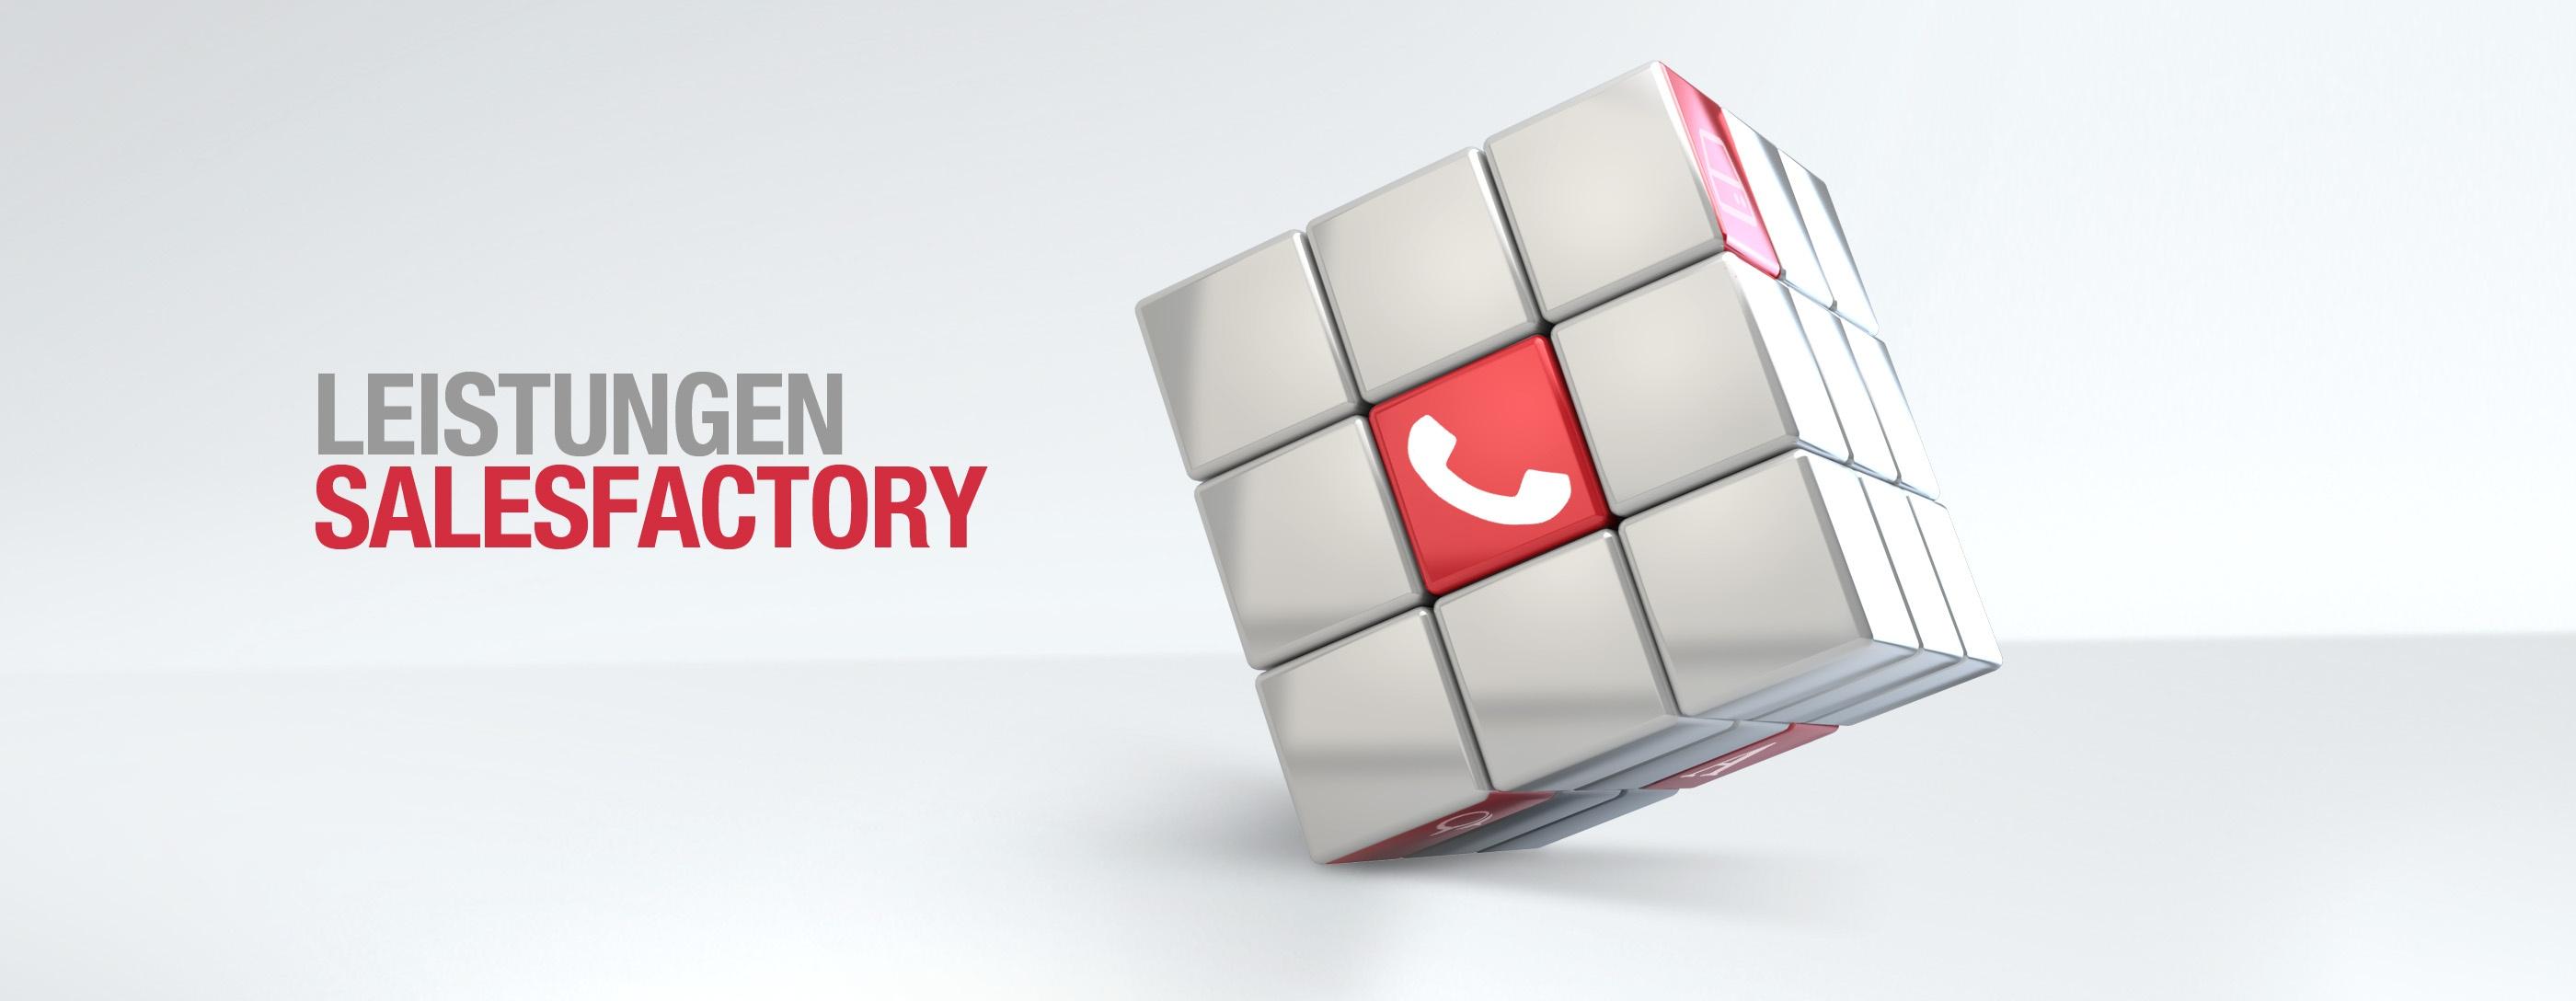 leistungen_salesfactory.jpg